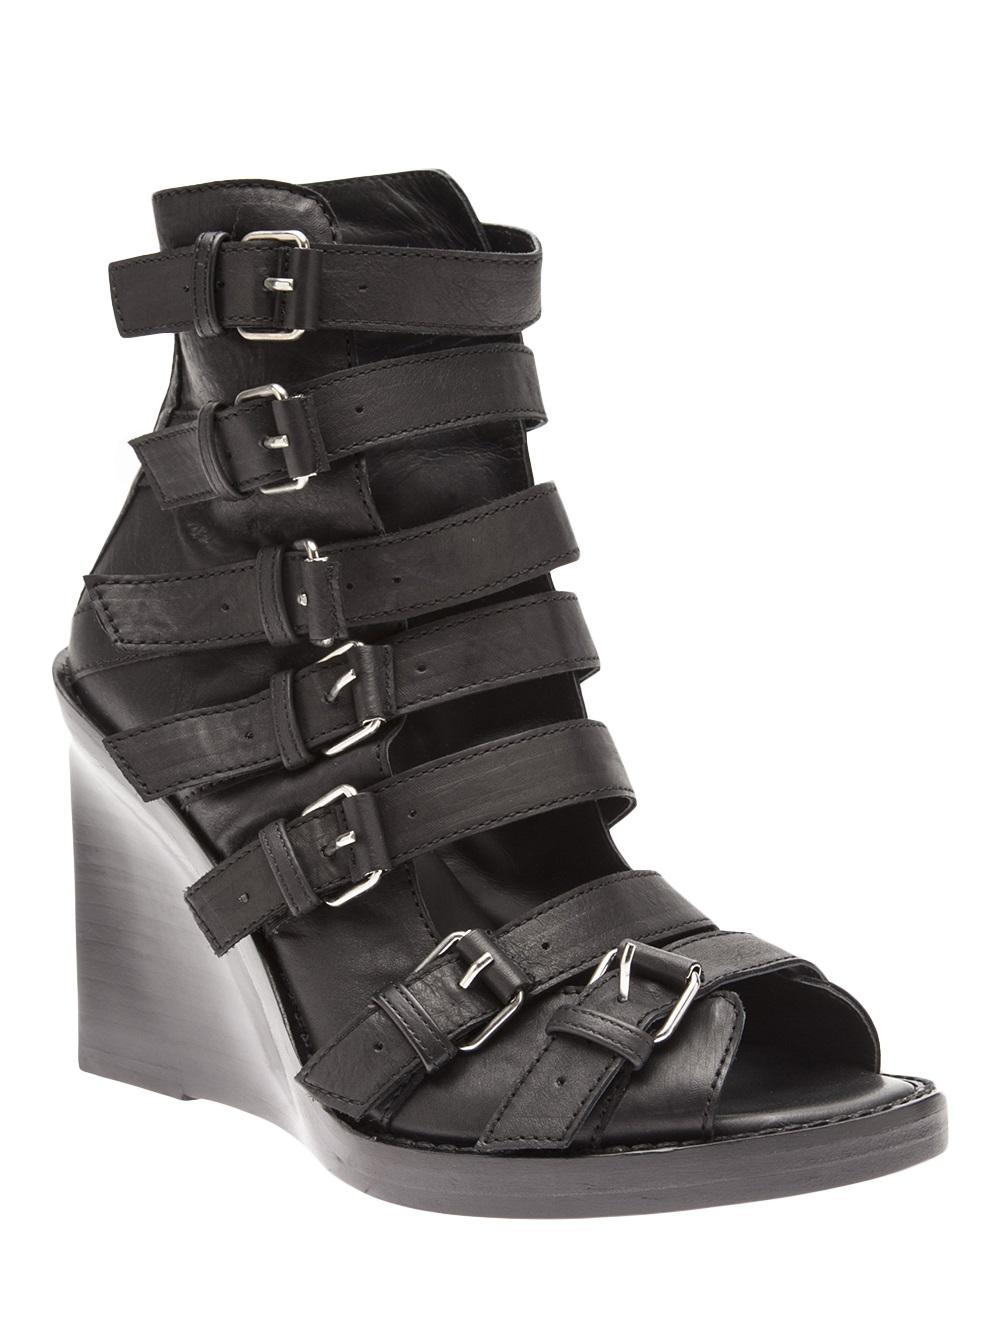 Ann Demeulemeester Strappy Wedge Sandal In Black Lyst